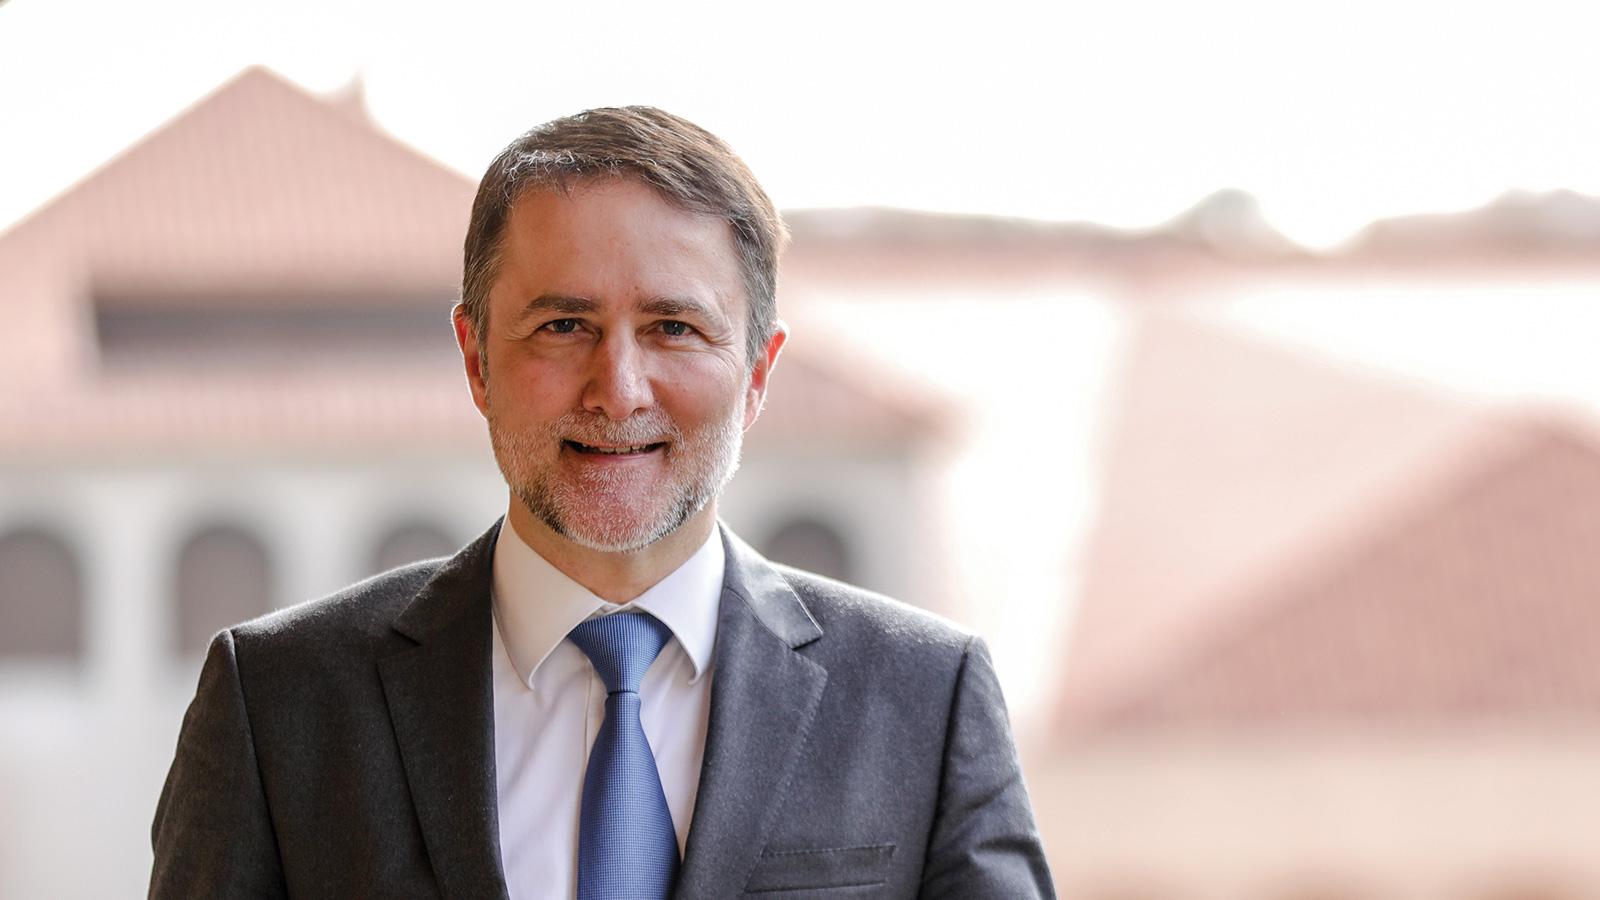 Philippe-Ortelli-FEDEM-2019-@-Iulian-Giurca-0F7A4099